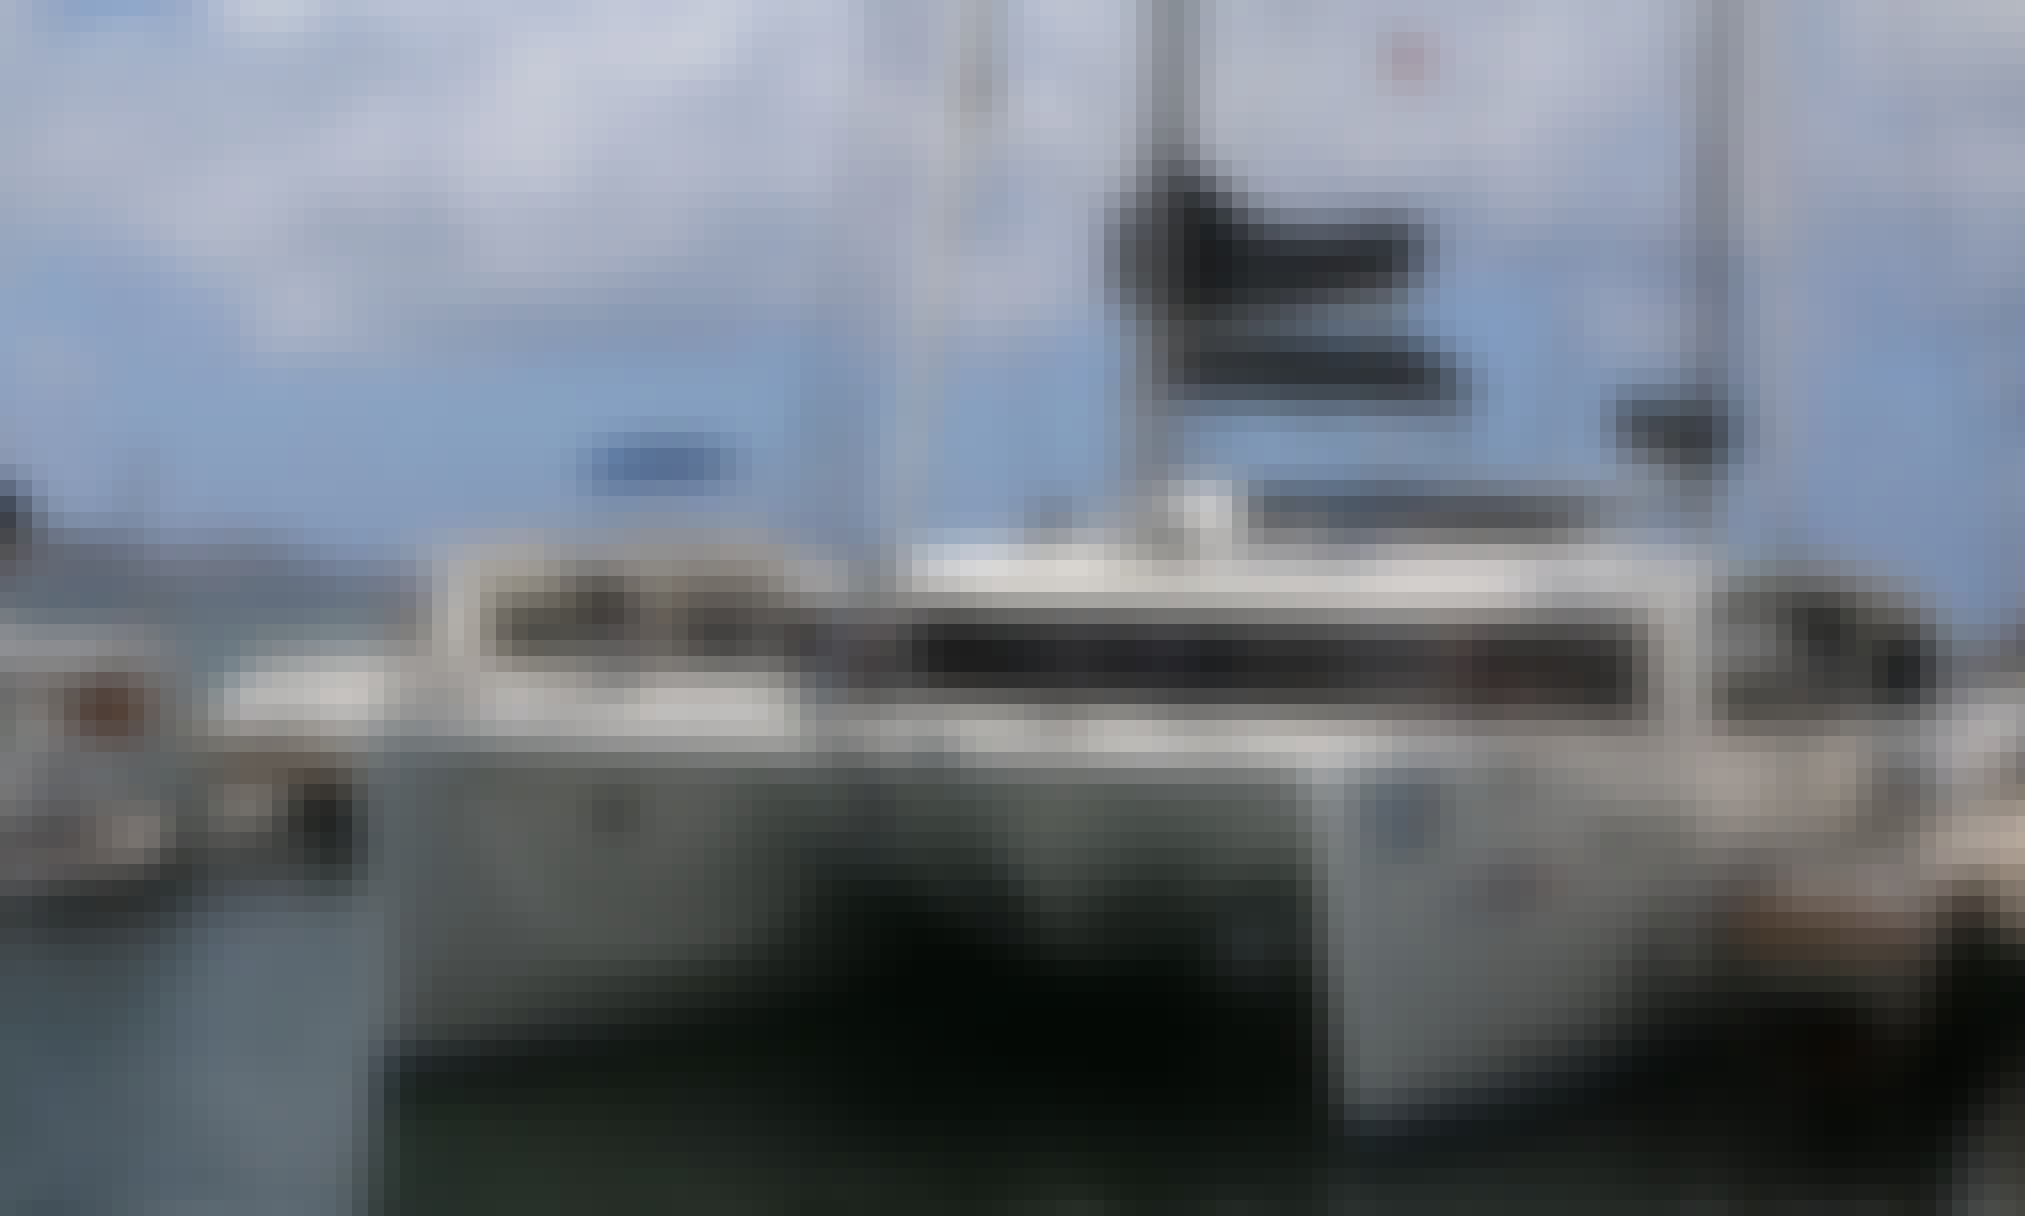 Charter a Lagoon 450 Cruising Catamaran for 10 Person in Tortola, British Virgin Islands!